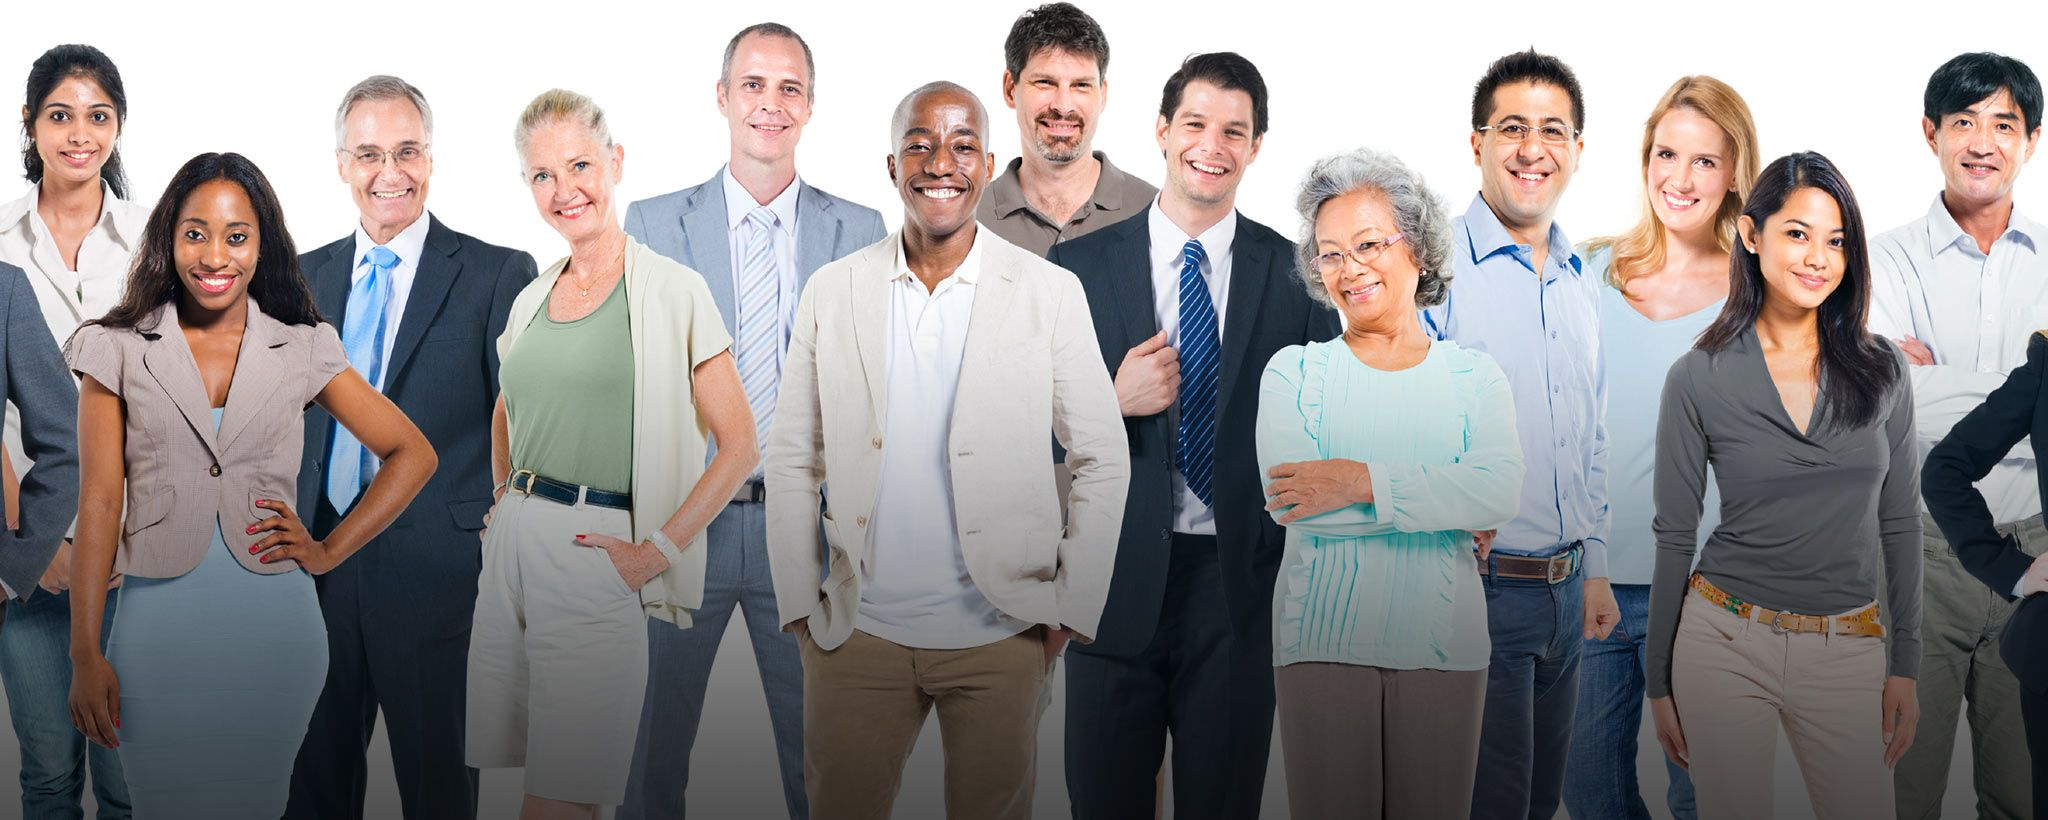 Diversity | Careers | Corning.com